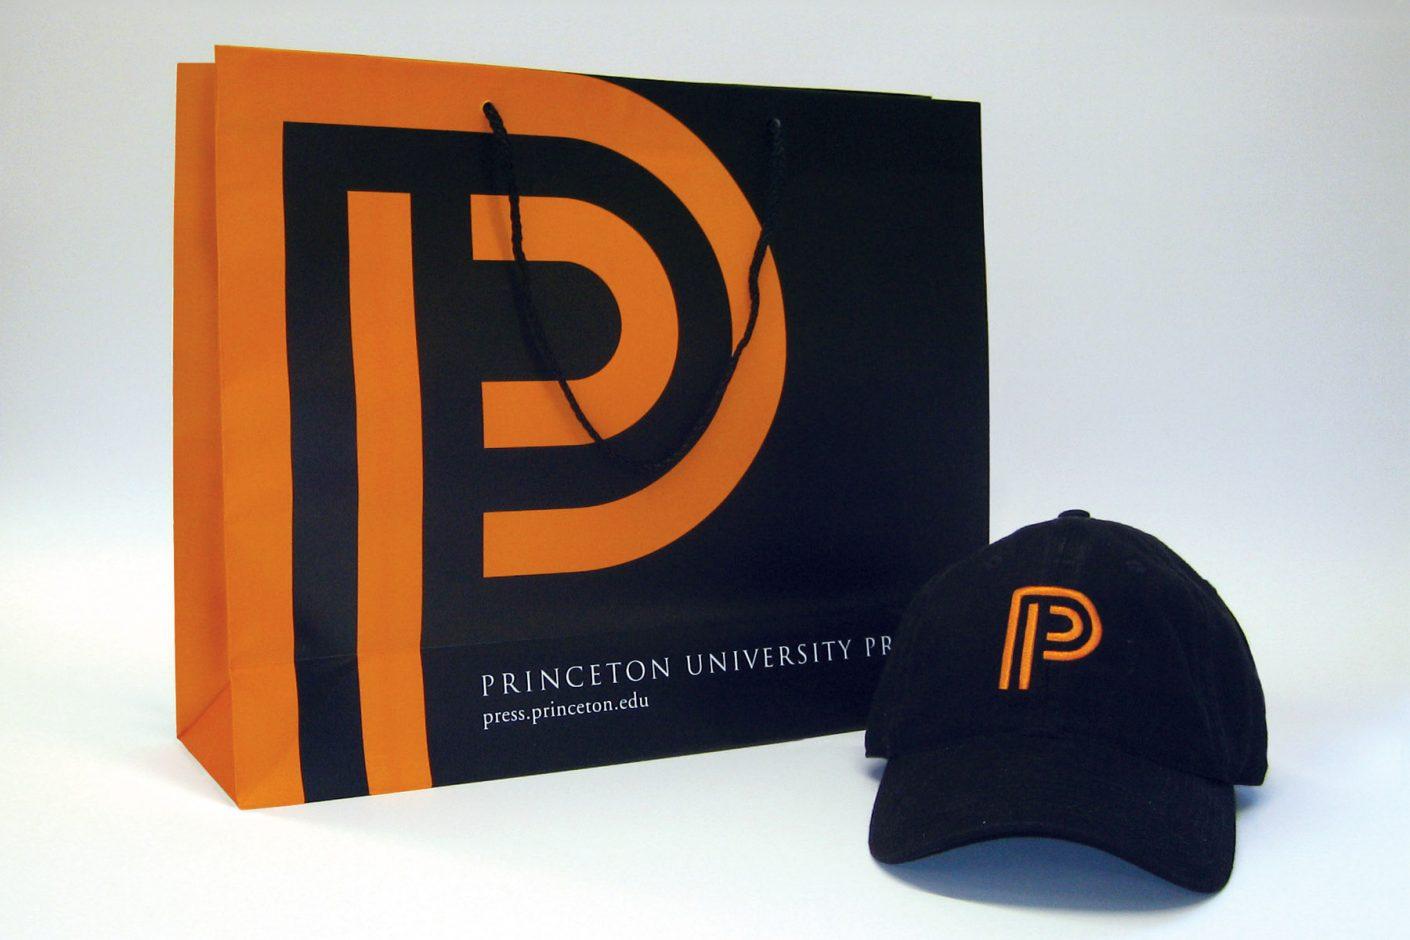 Princeton University Press photo